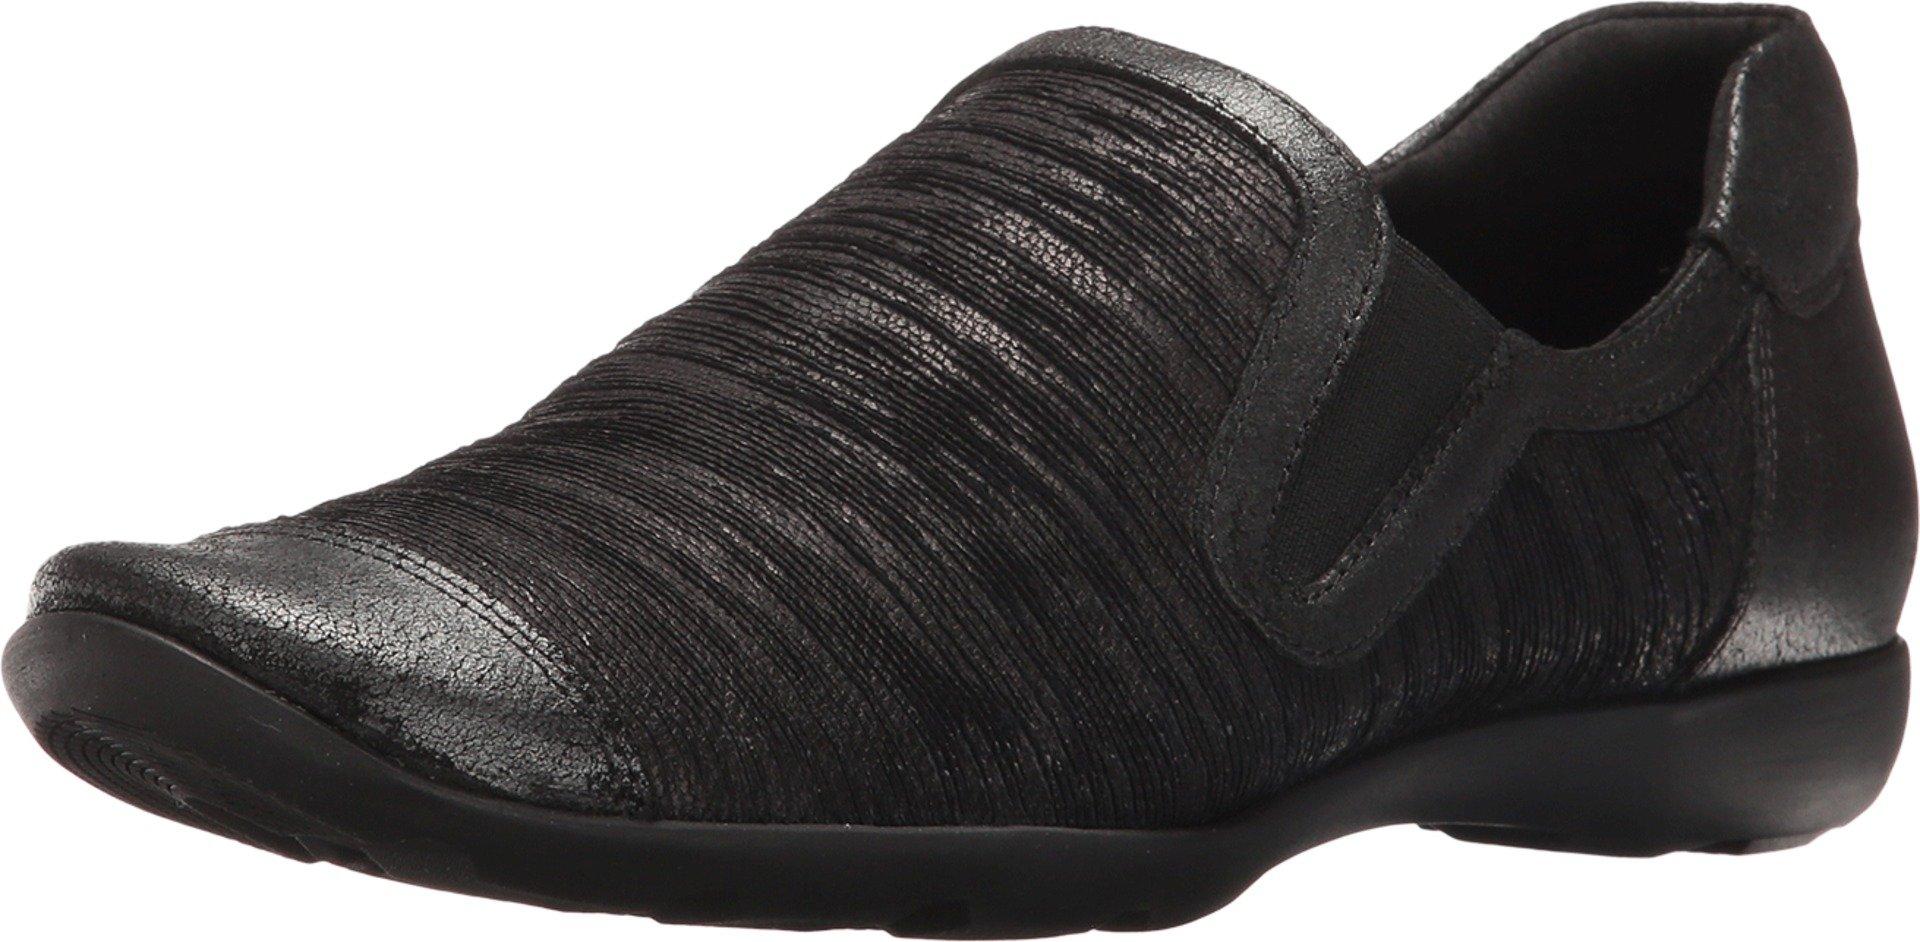 Sesto Meucci Women's Gift Black Aryn/Black Natan Sneaker 8 M (B)